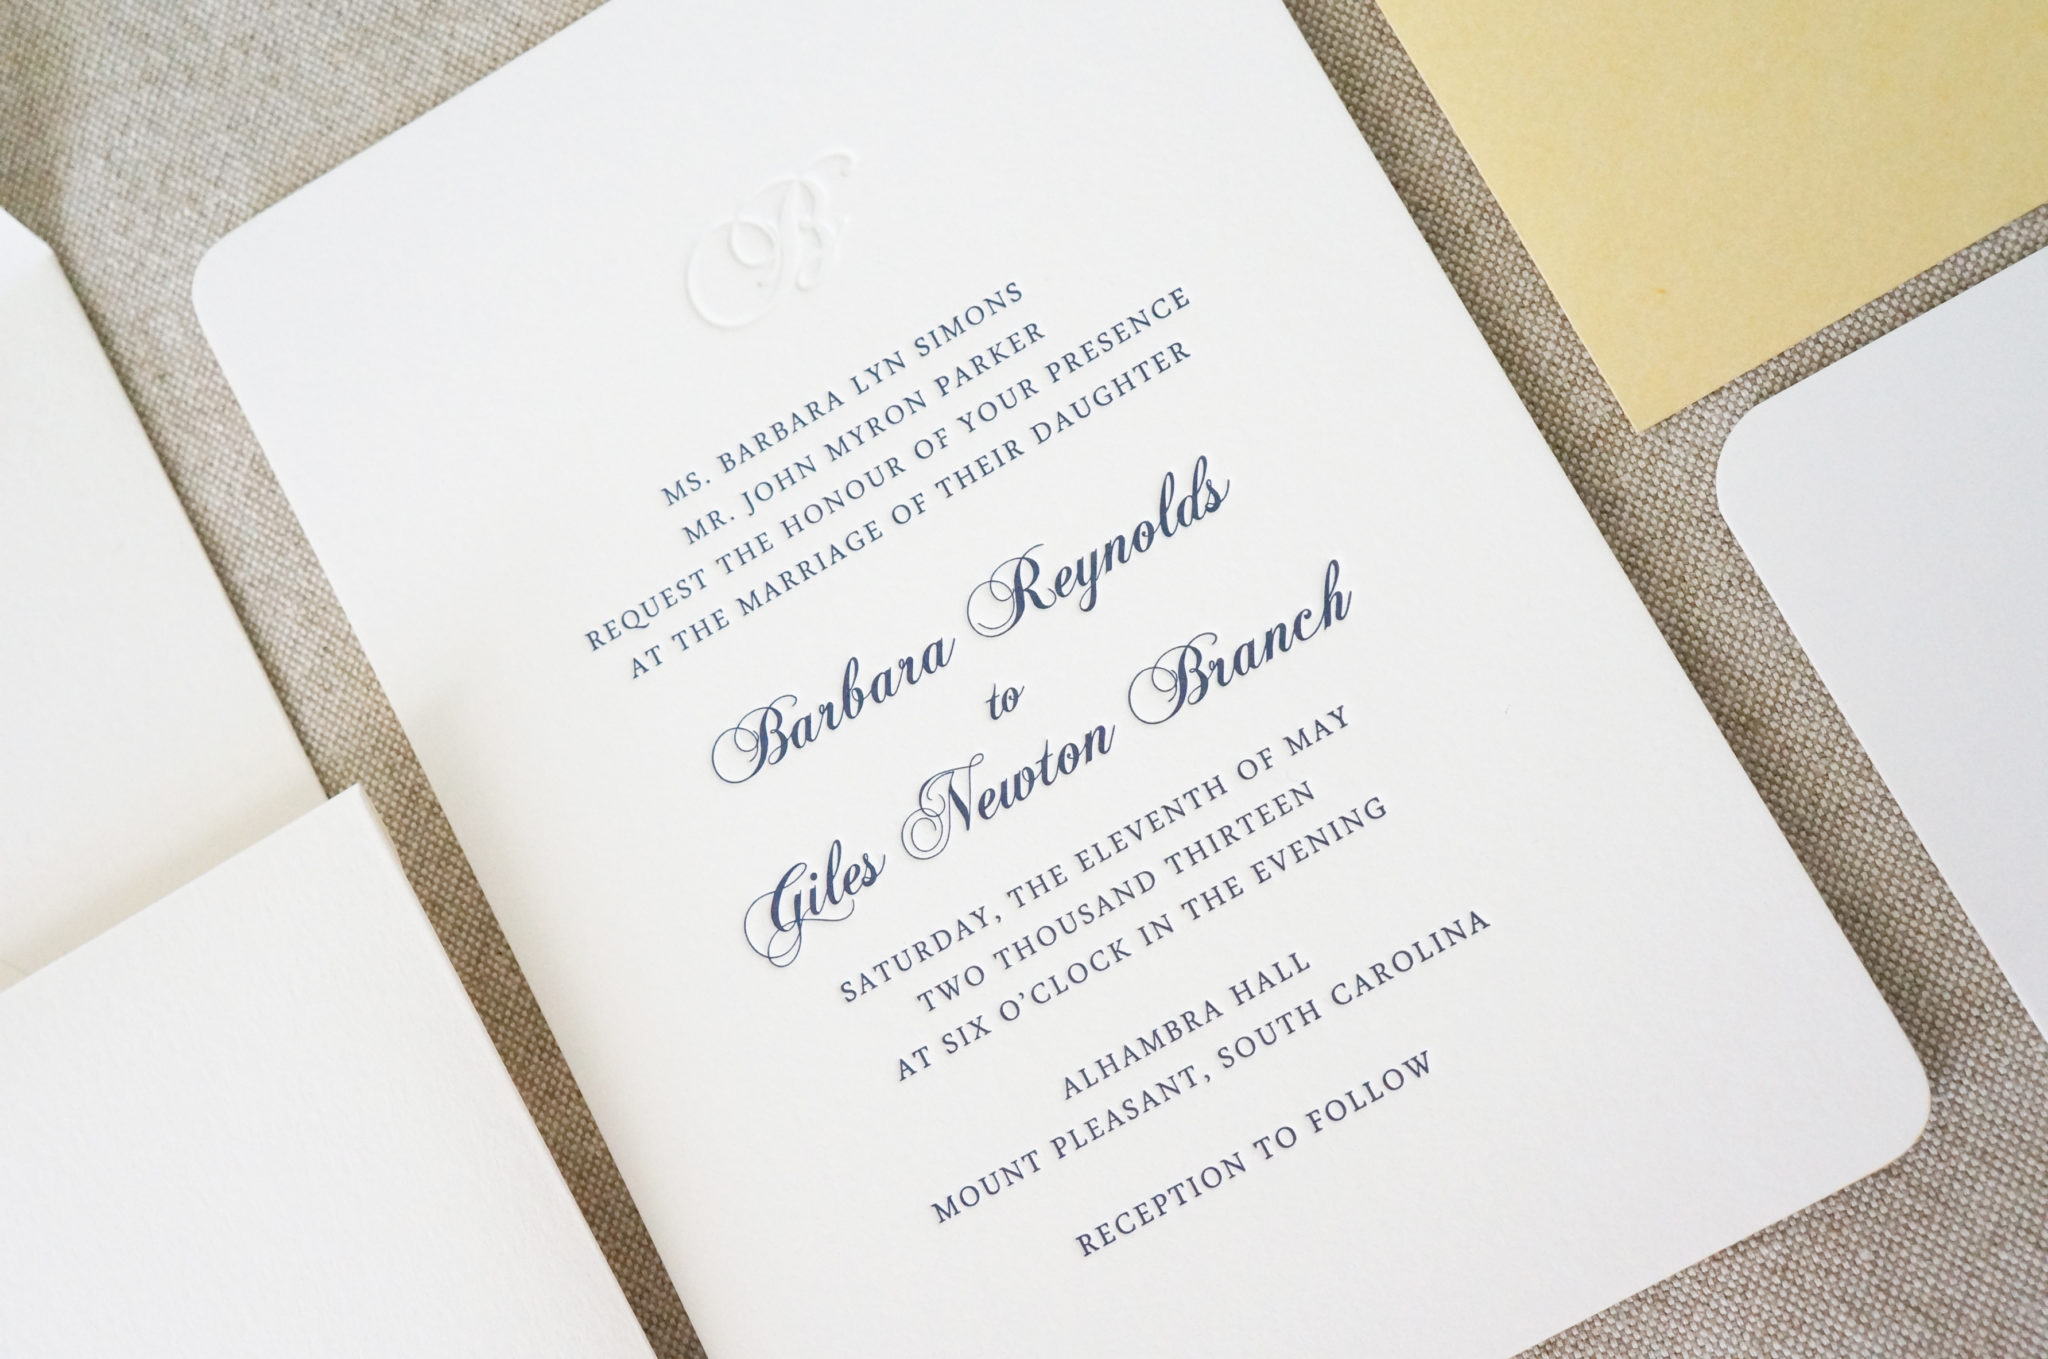 charleston sc wedding invitations - 28 images - charleston wedding ...